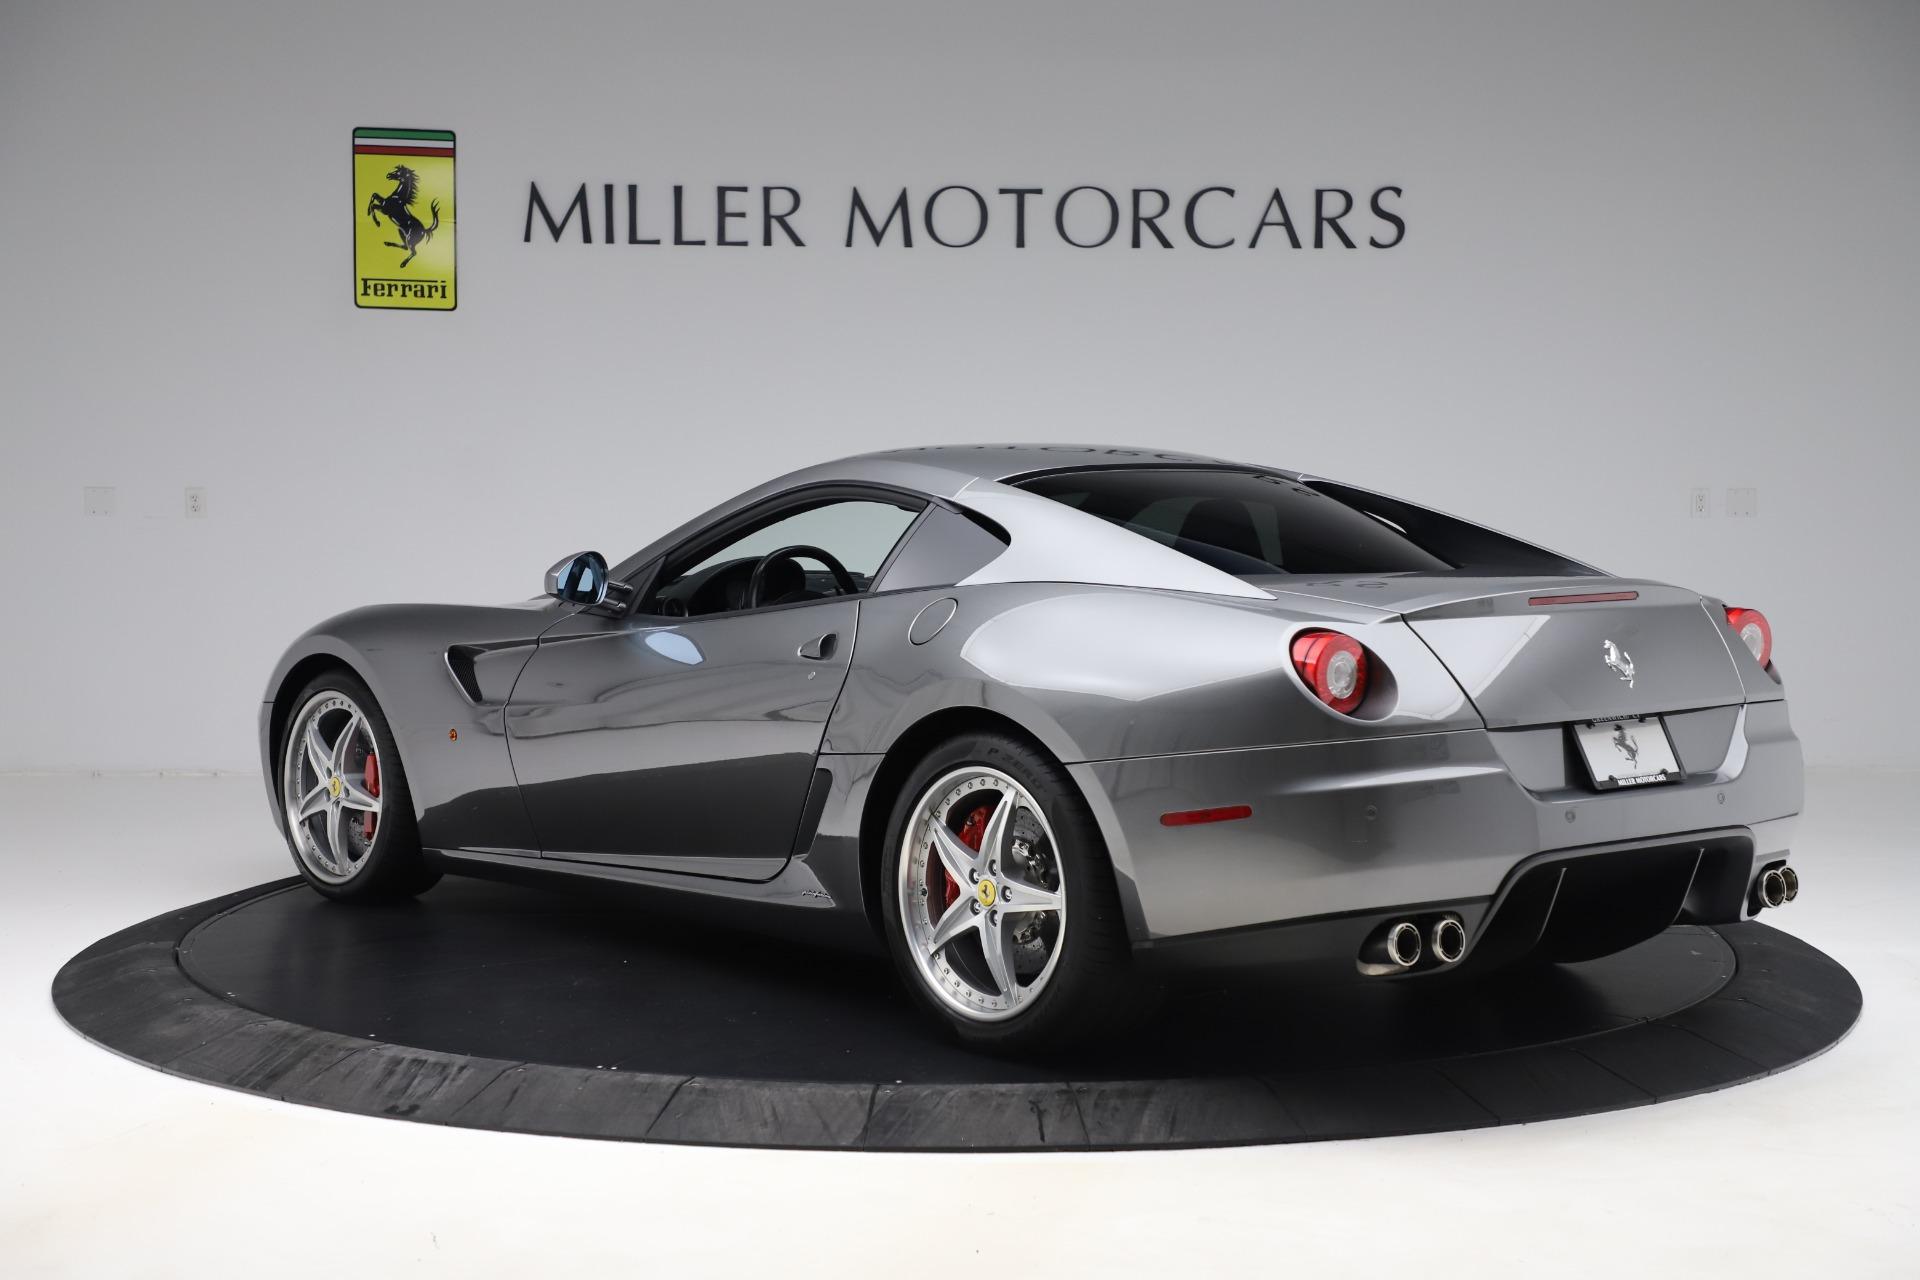 Pre Owned 2010 Ferrari 599 Gtb Fiorano Hgte For Sale Miller Motorcars Stock F2036a